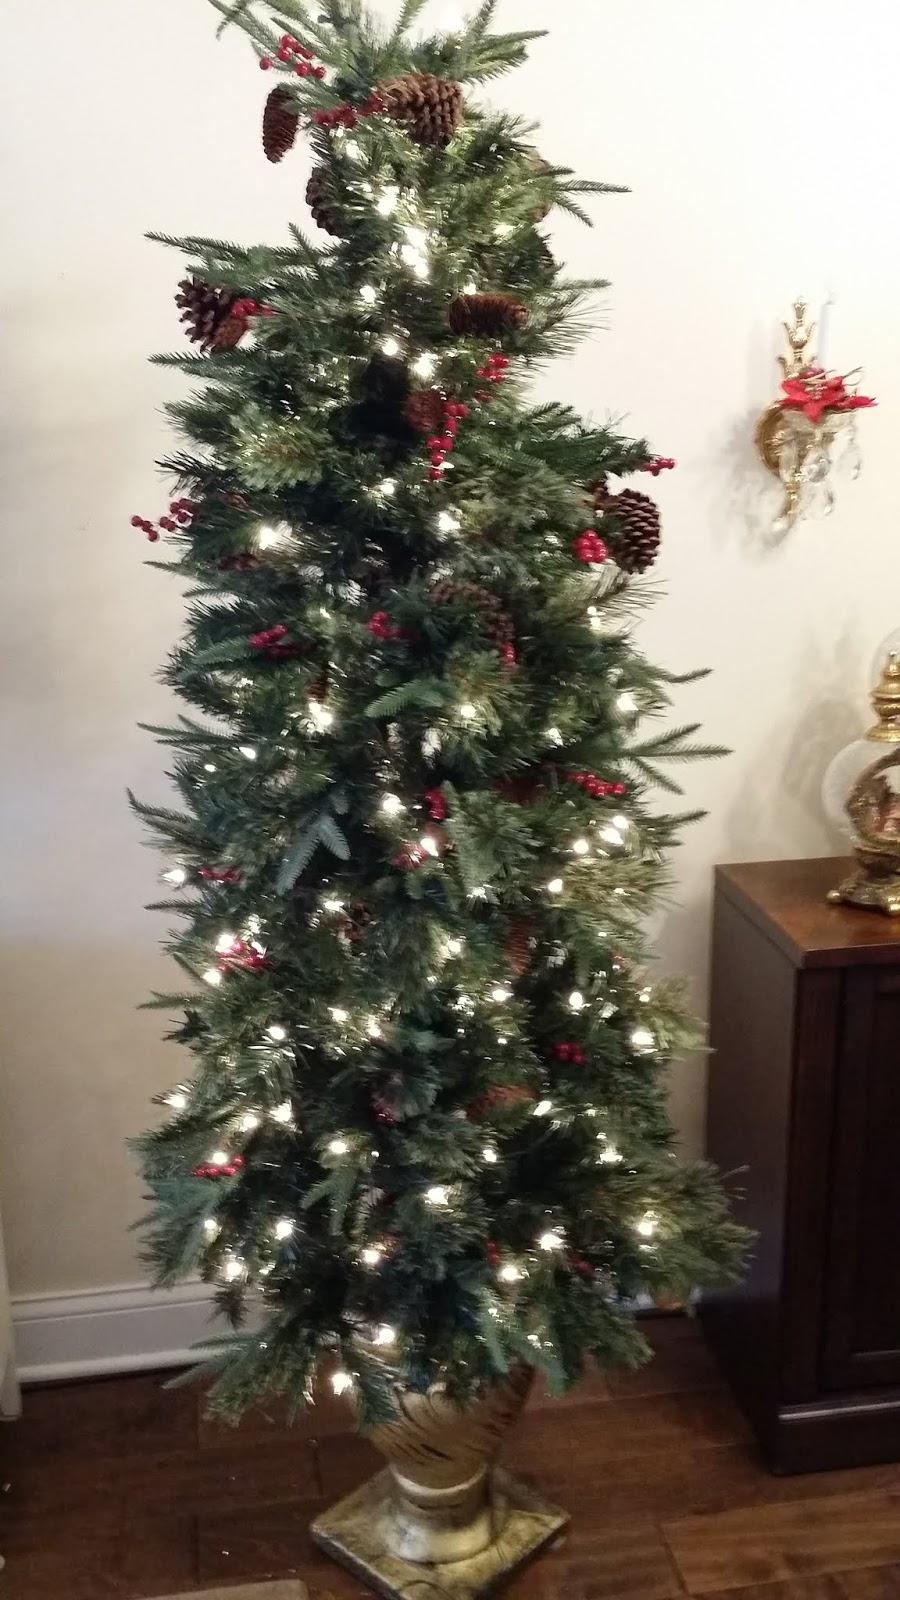 My Christmas Dream 2019.Dream Mom My Christmas Tree